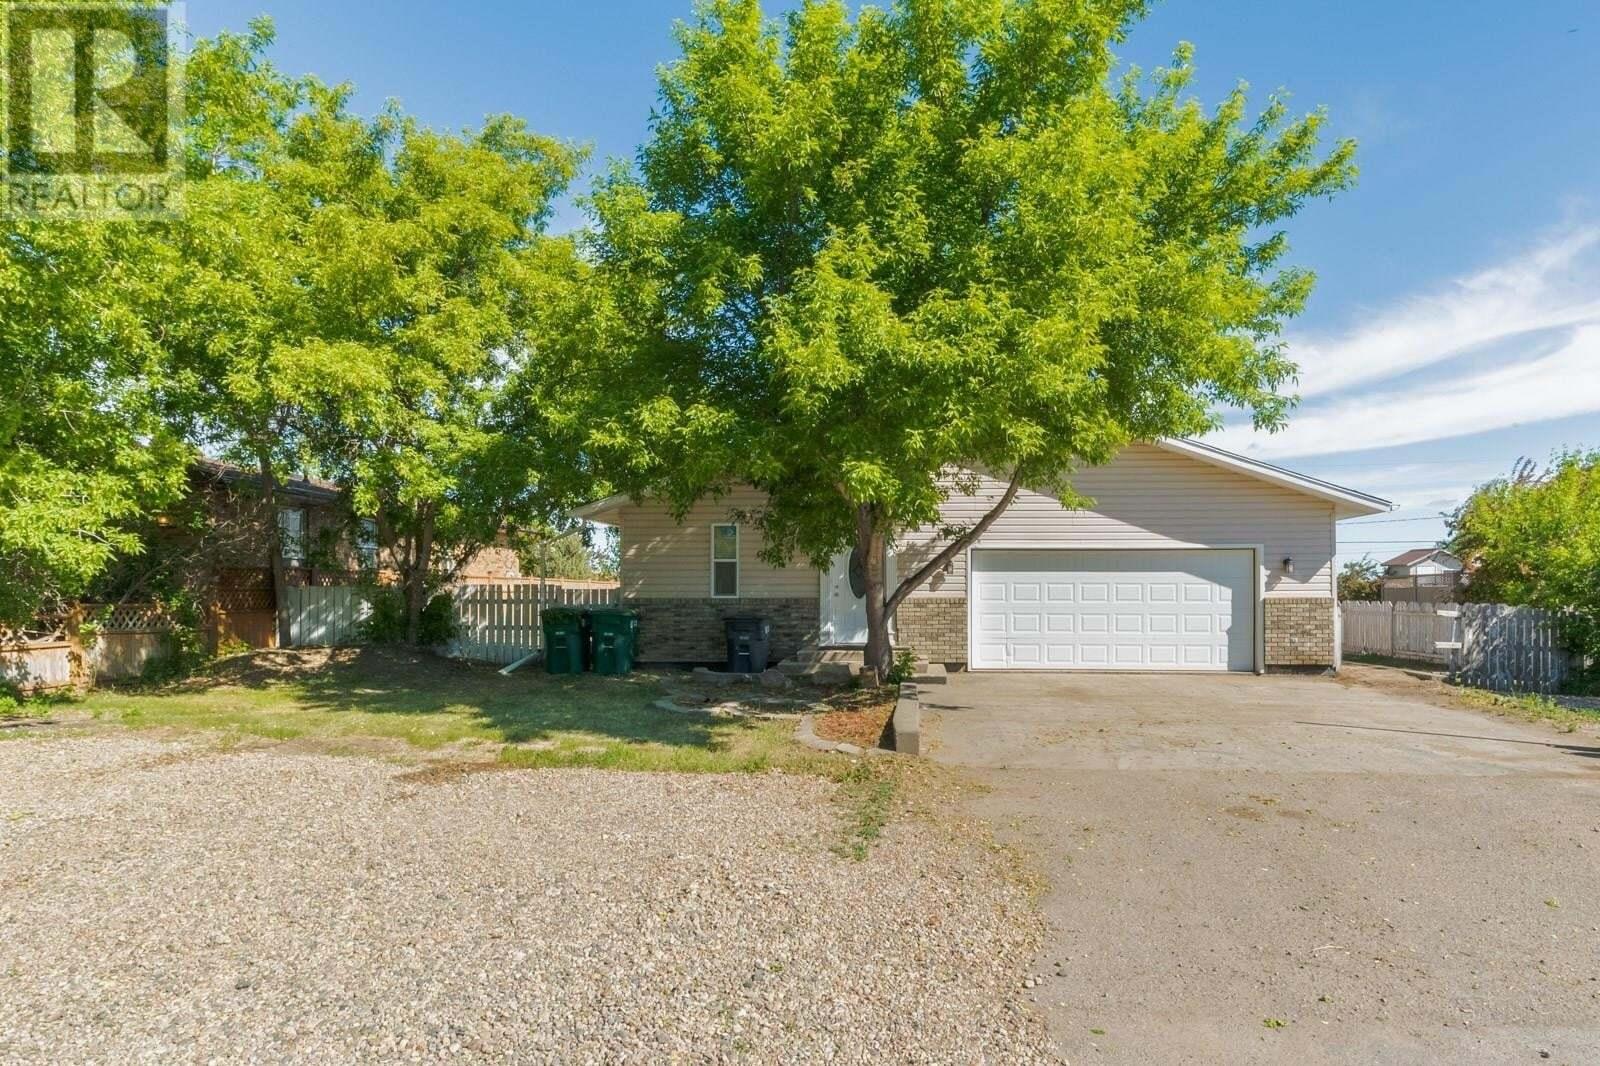 House for sale at 602 3rd Ave Pilot Butte Saskatchewan - MLS: SK811052